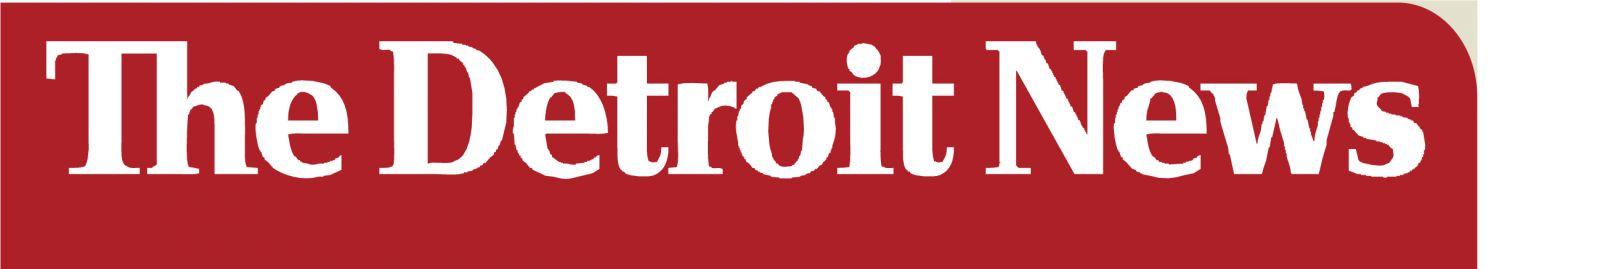 Detroit awarded $30 million grant for affordable housing around Corktown